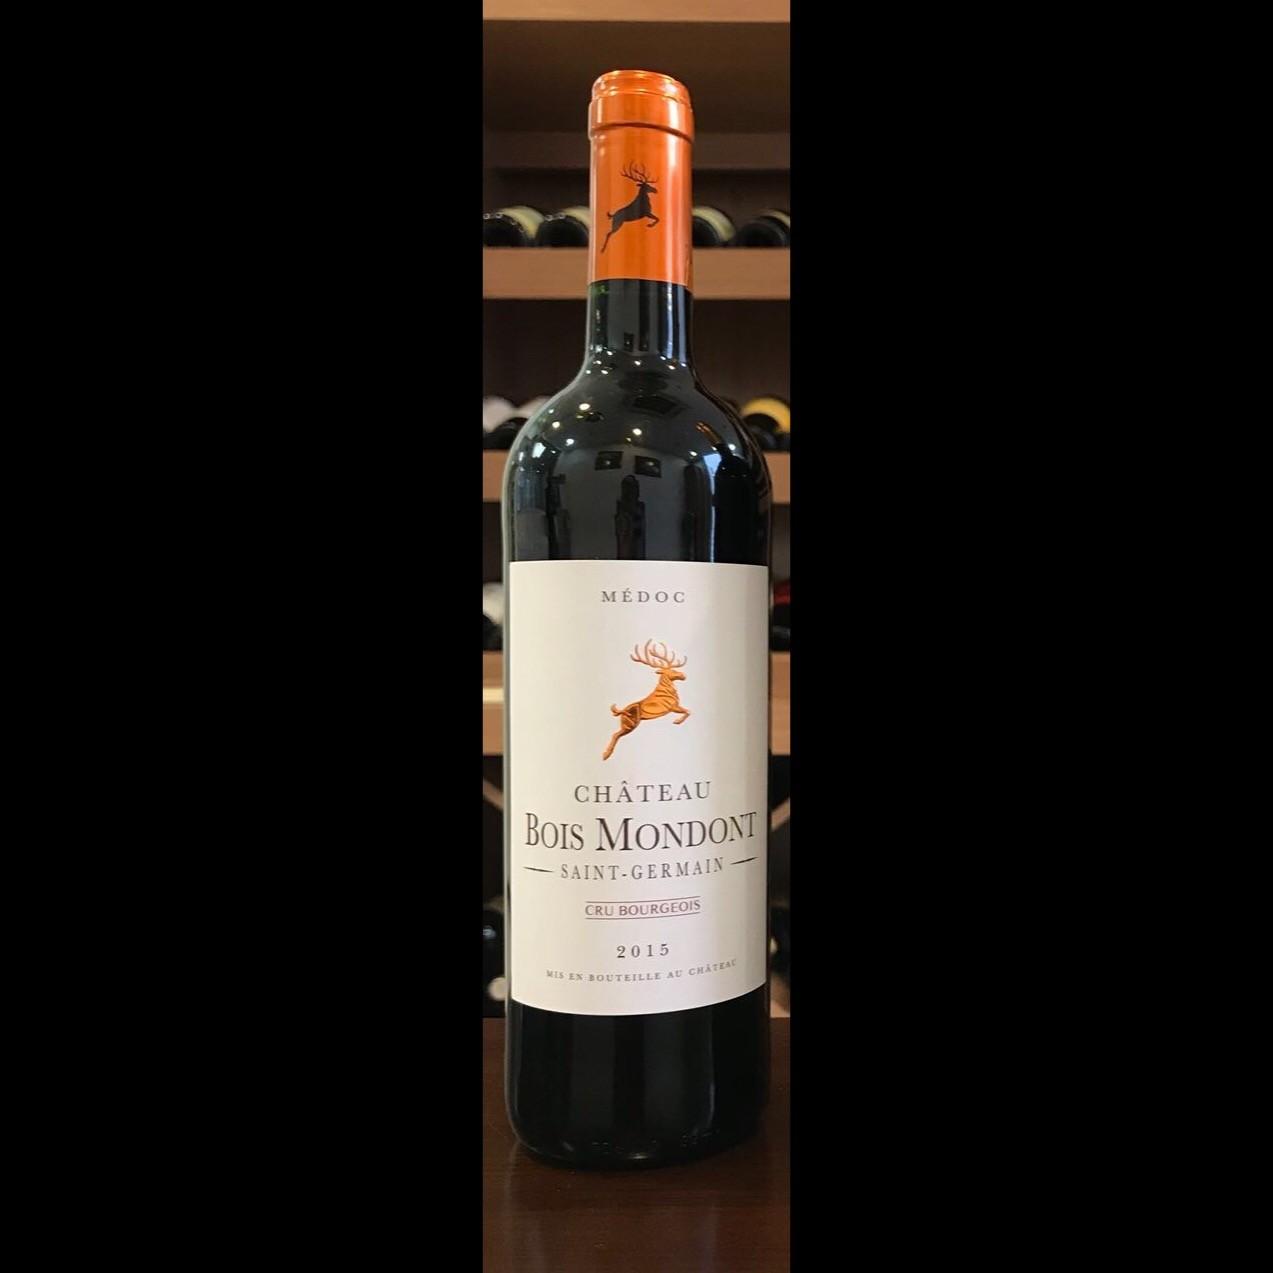 "Chateau Bois Mondont 2015 (""6x750ml"" bottles/carton)"